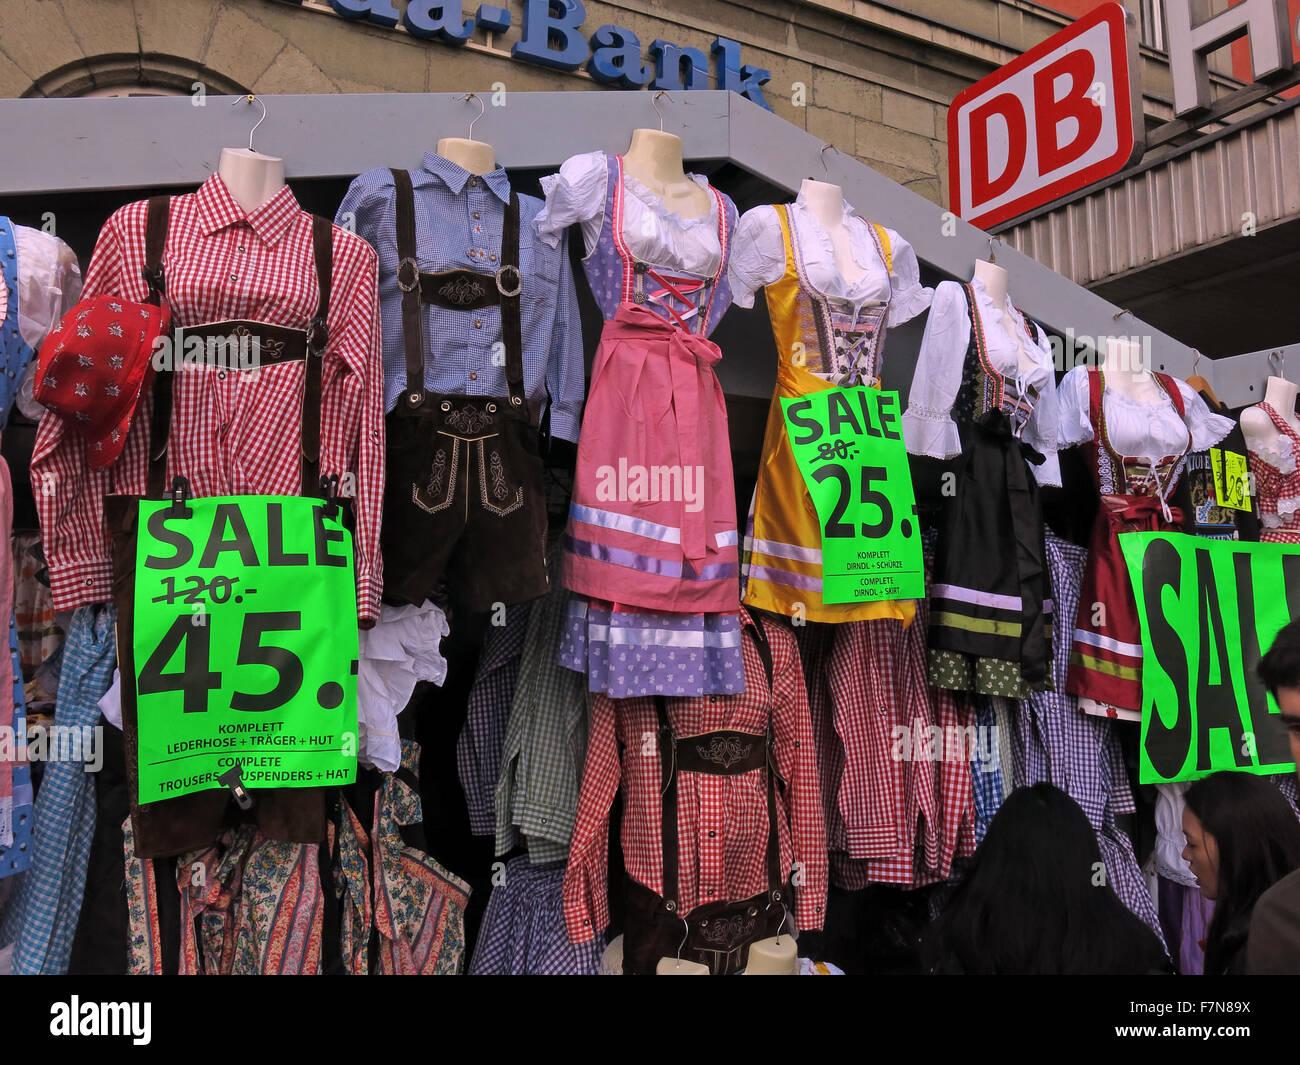 sale,prices,for,sale,reduced,Octoberfest,beer,bier,festival,railway,station,gear,Hbf,central,stall,market,price,prices,Bavarian,lederhosen,hat,tourist,tourists,Dirndl,leather,Bundhosen,Kniebundhosen,traditional,clothing,clothes,Alpine,dress,skirt,mixed,mixture of dress,DB,For Sale,GoTonySmith,Munich,Oktoberfest,in,Germany,Volksfest,beer,festival,and,travelling,funfair,Bavaria,event,Wiesn,fairgrounds,Octoberfest,October,Autumn,Theresienwiese,field,or,meadow,of,Therese,centre,beer,center,bier,roast,pork,chicken,building,buildings,Brezen,pretzels,Knödel,potato,bread,dumplings,Käsespätzle,Reiberdatschi,pancake,Sauerkraut,or,Rotkohl,Blaukraut,ale,Dirndl,Lederhosen,Sennerhut,tent,Buy Pictures of,Buy Images Of,Unity Day,Oktoberfest beer,Beer festival